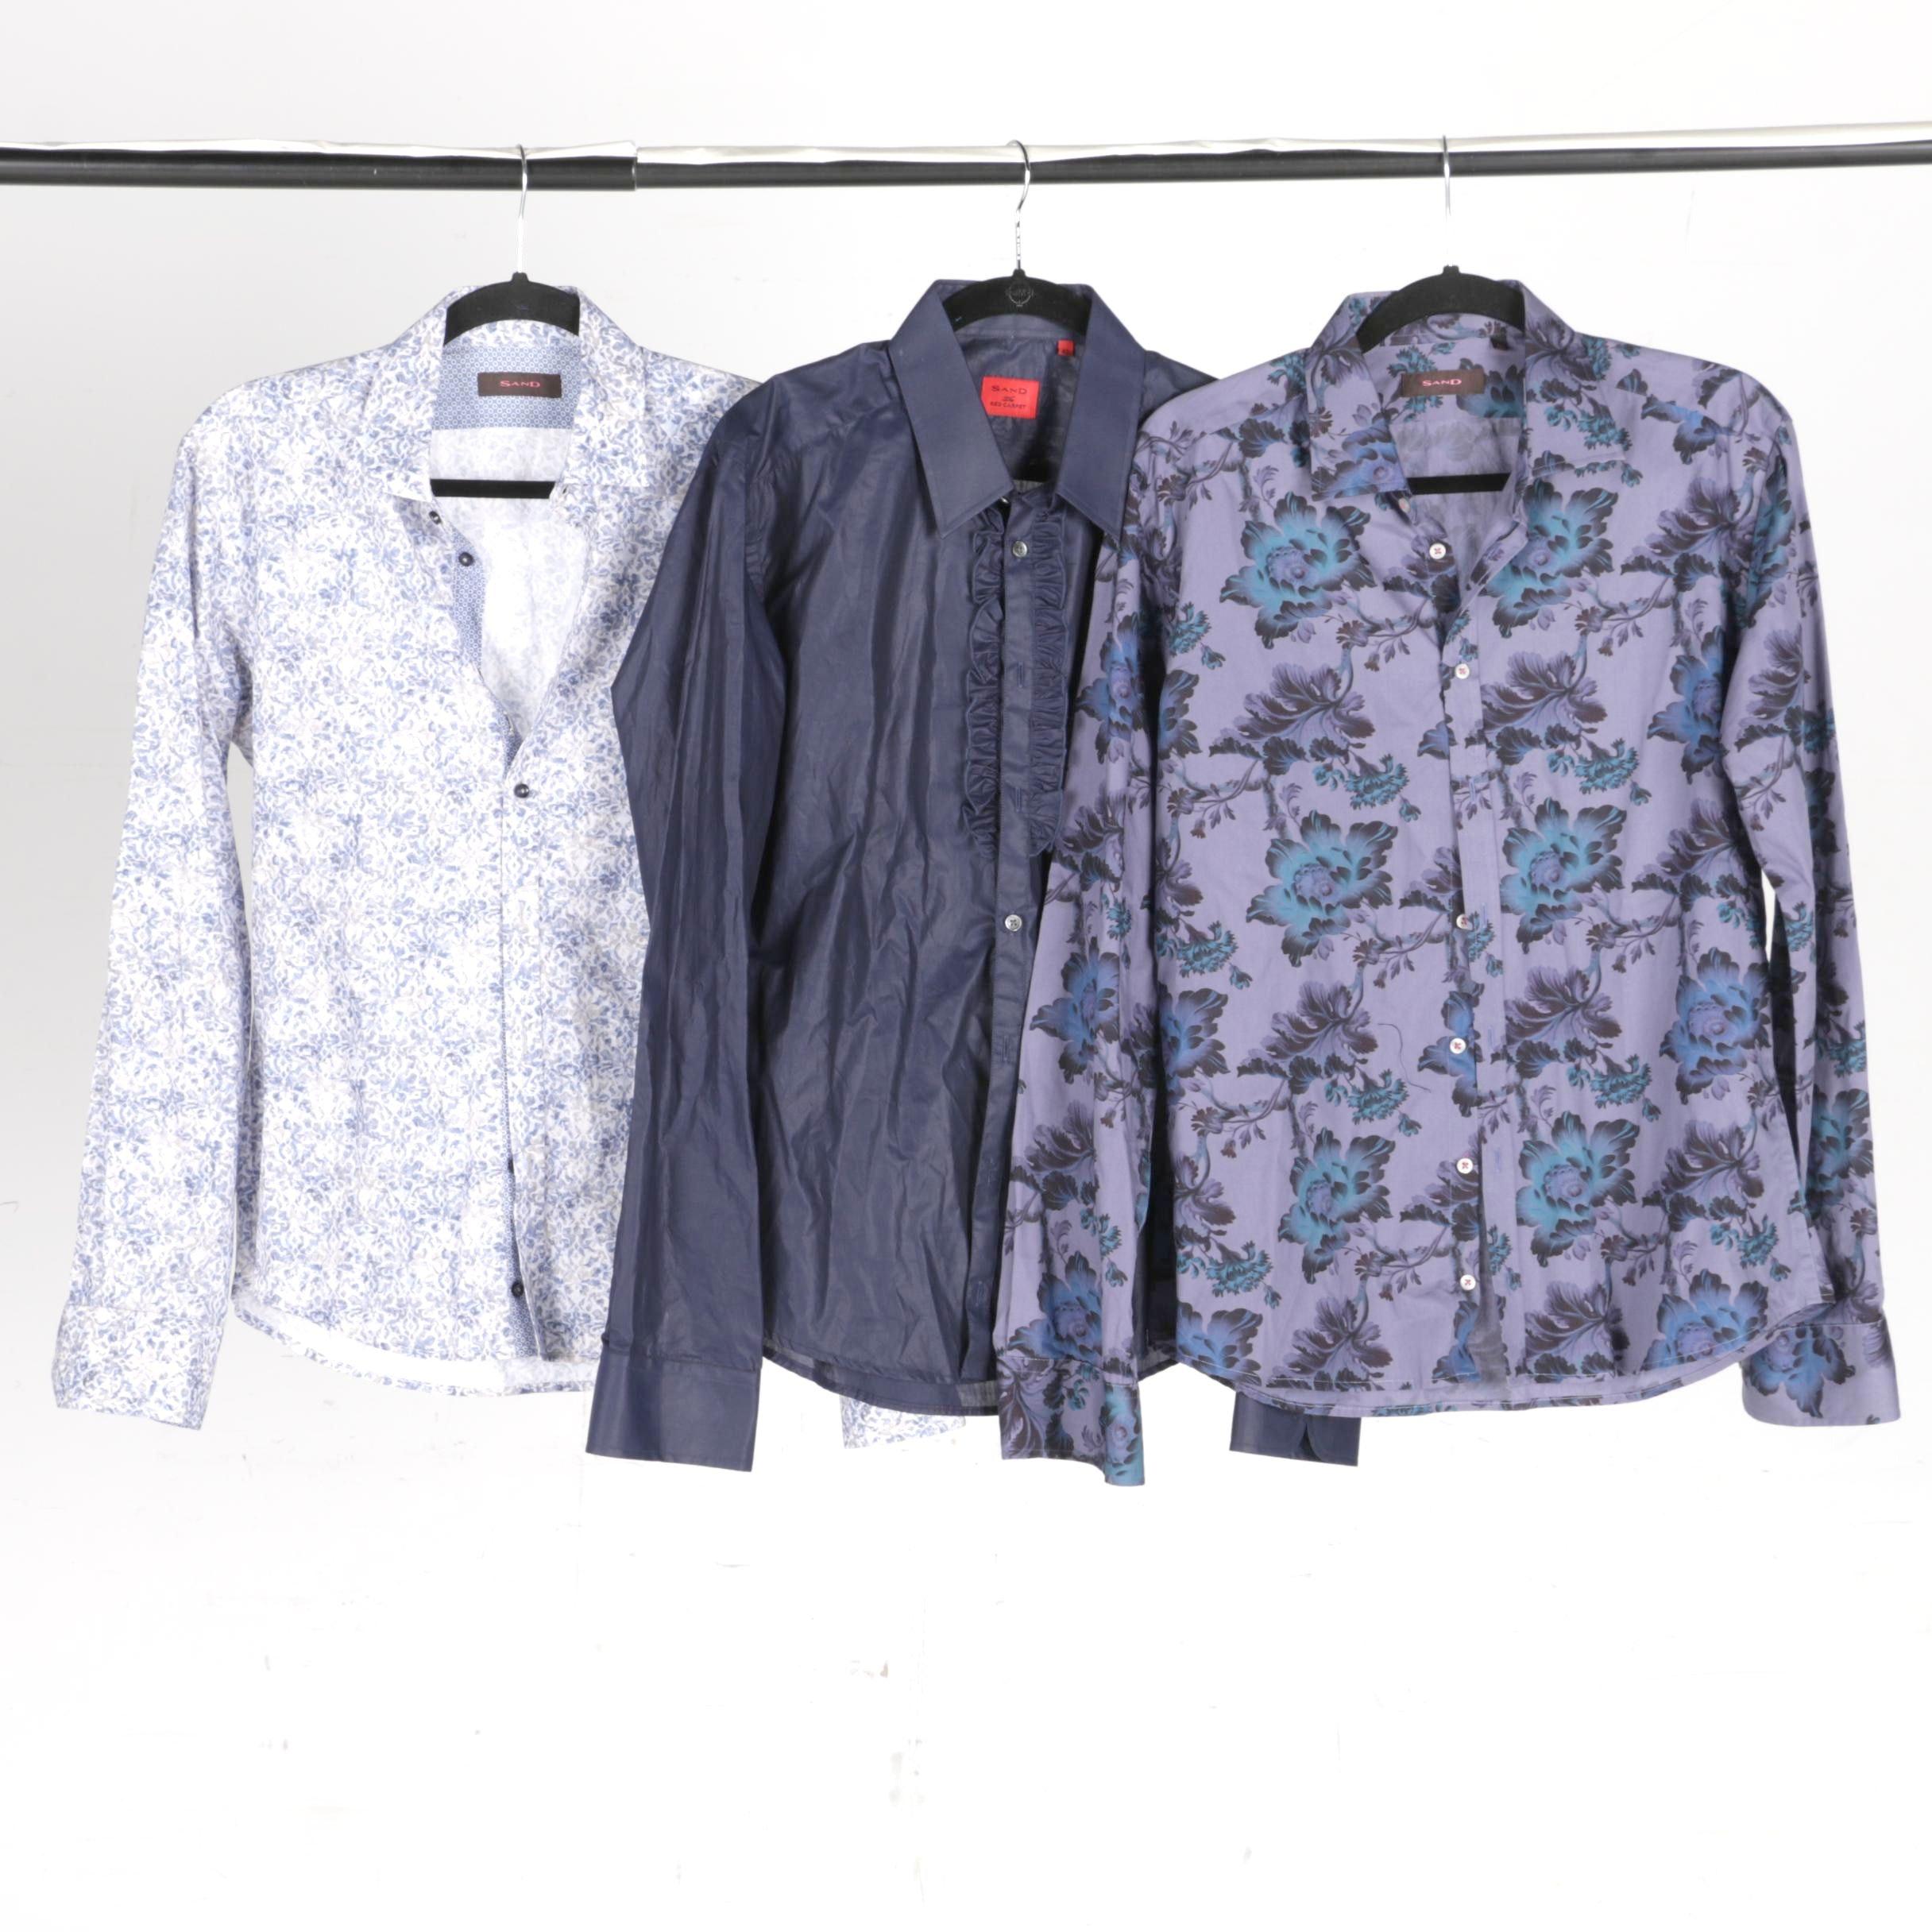 Men's Sand Button-Down Shirts